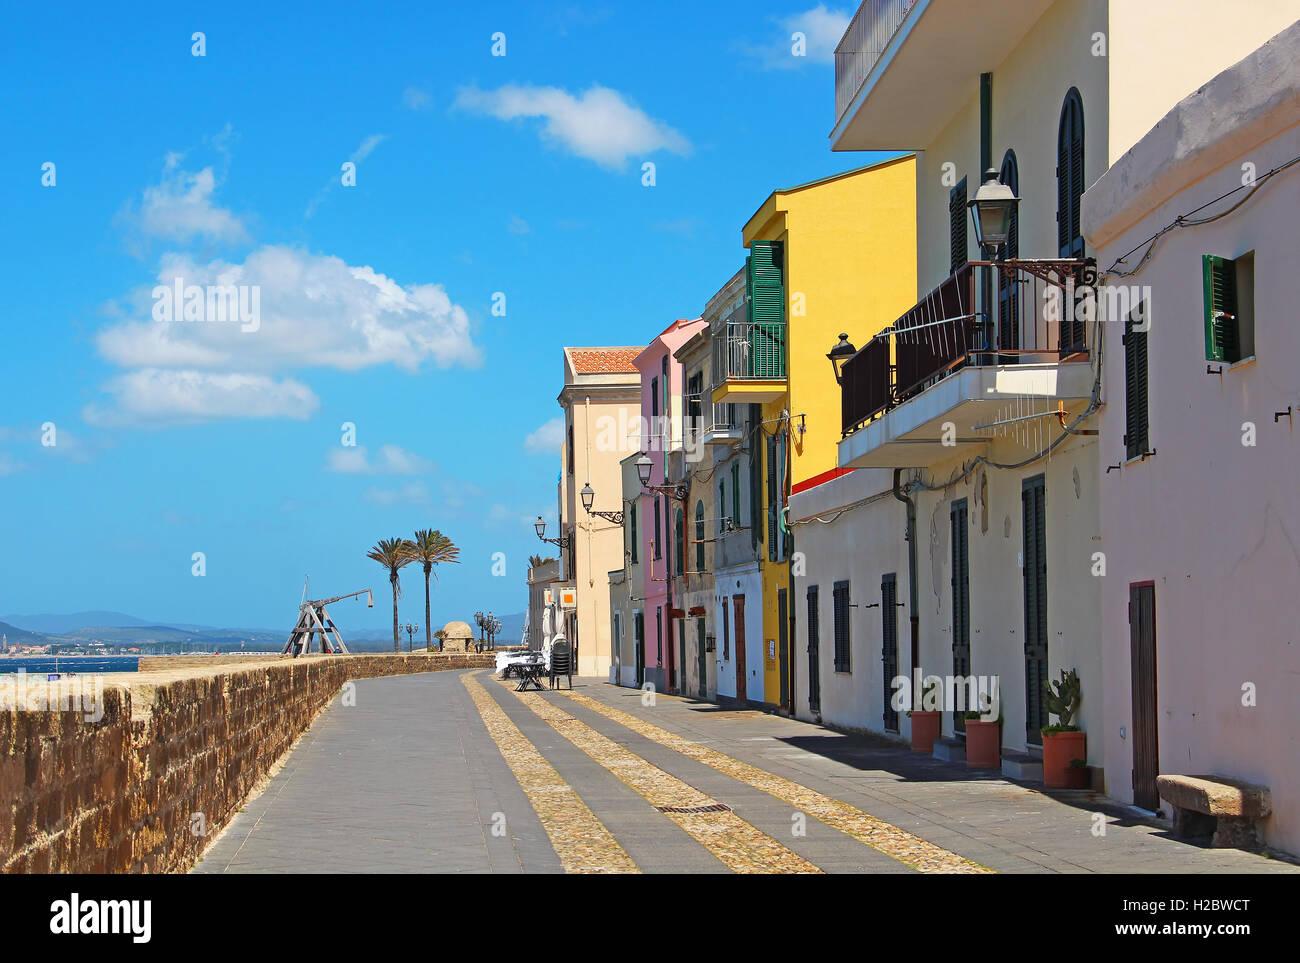 Promenade in Alghero old town, Sardinia, Italy - Stock Image